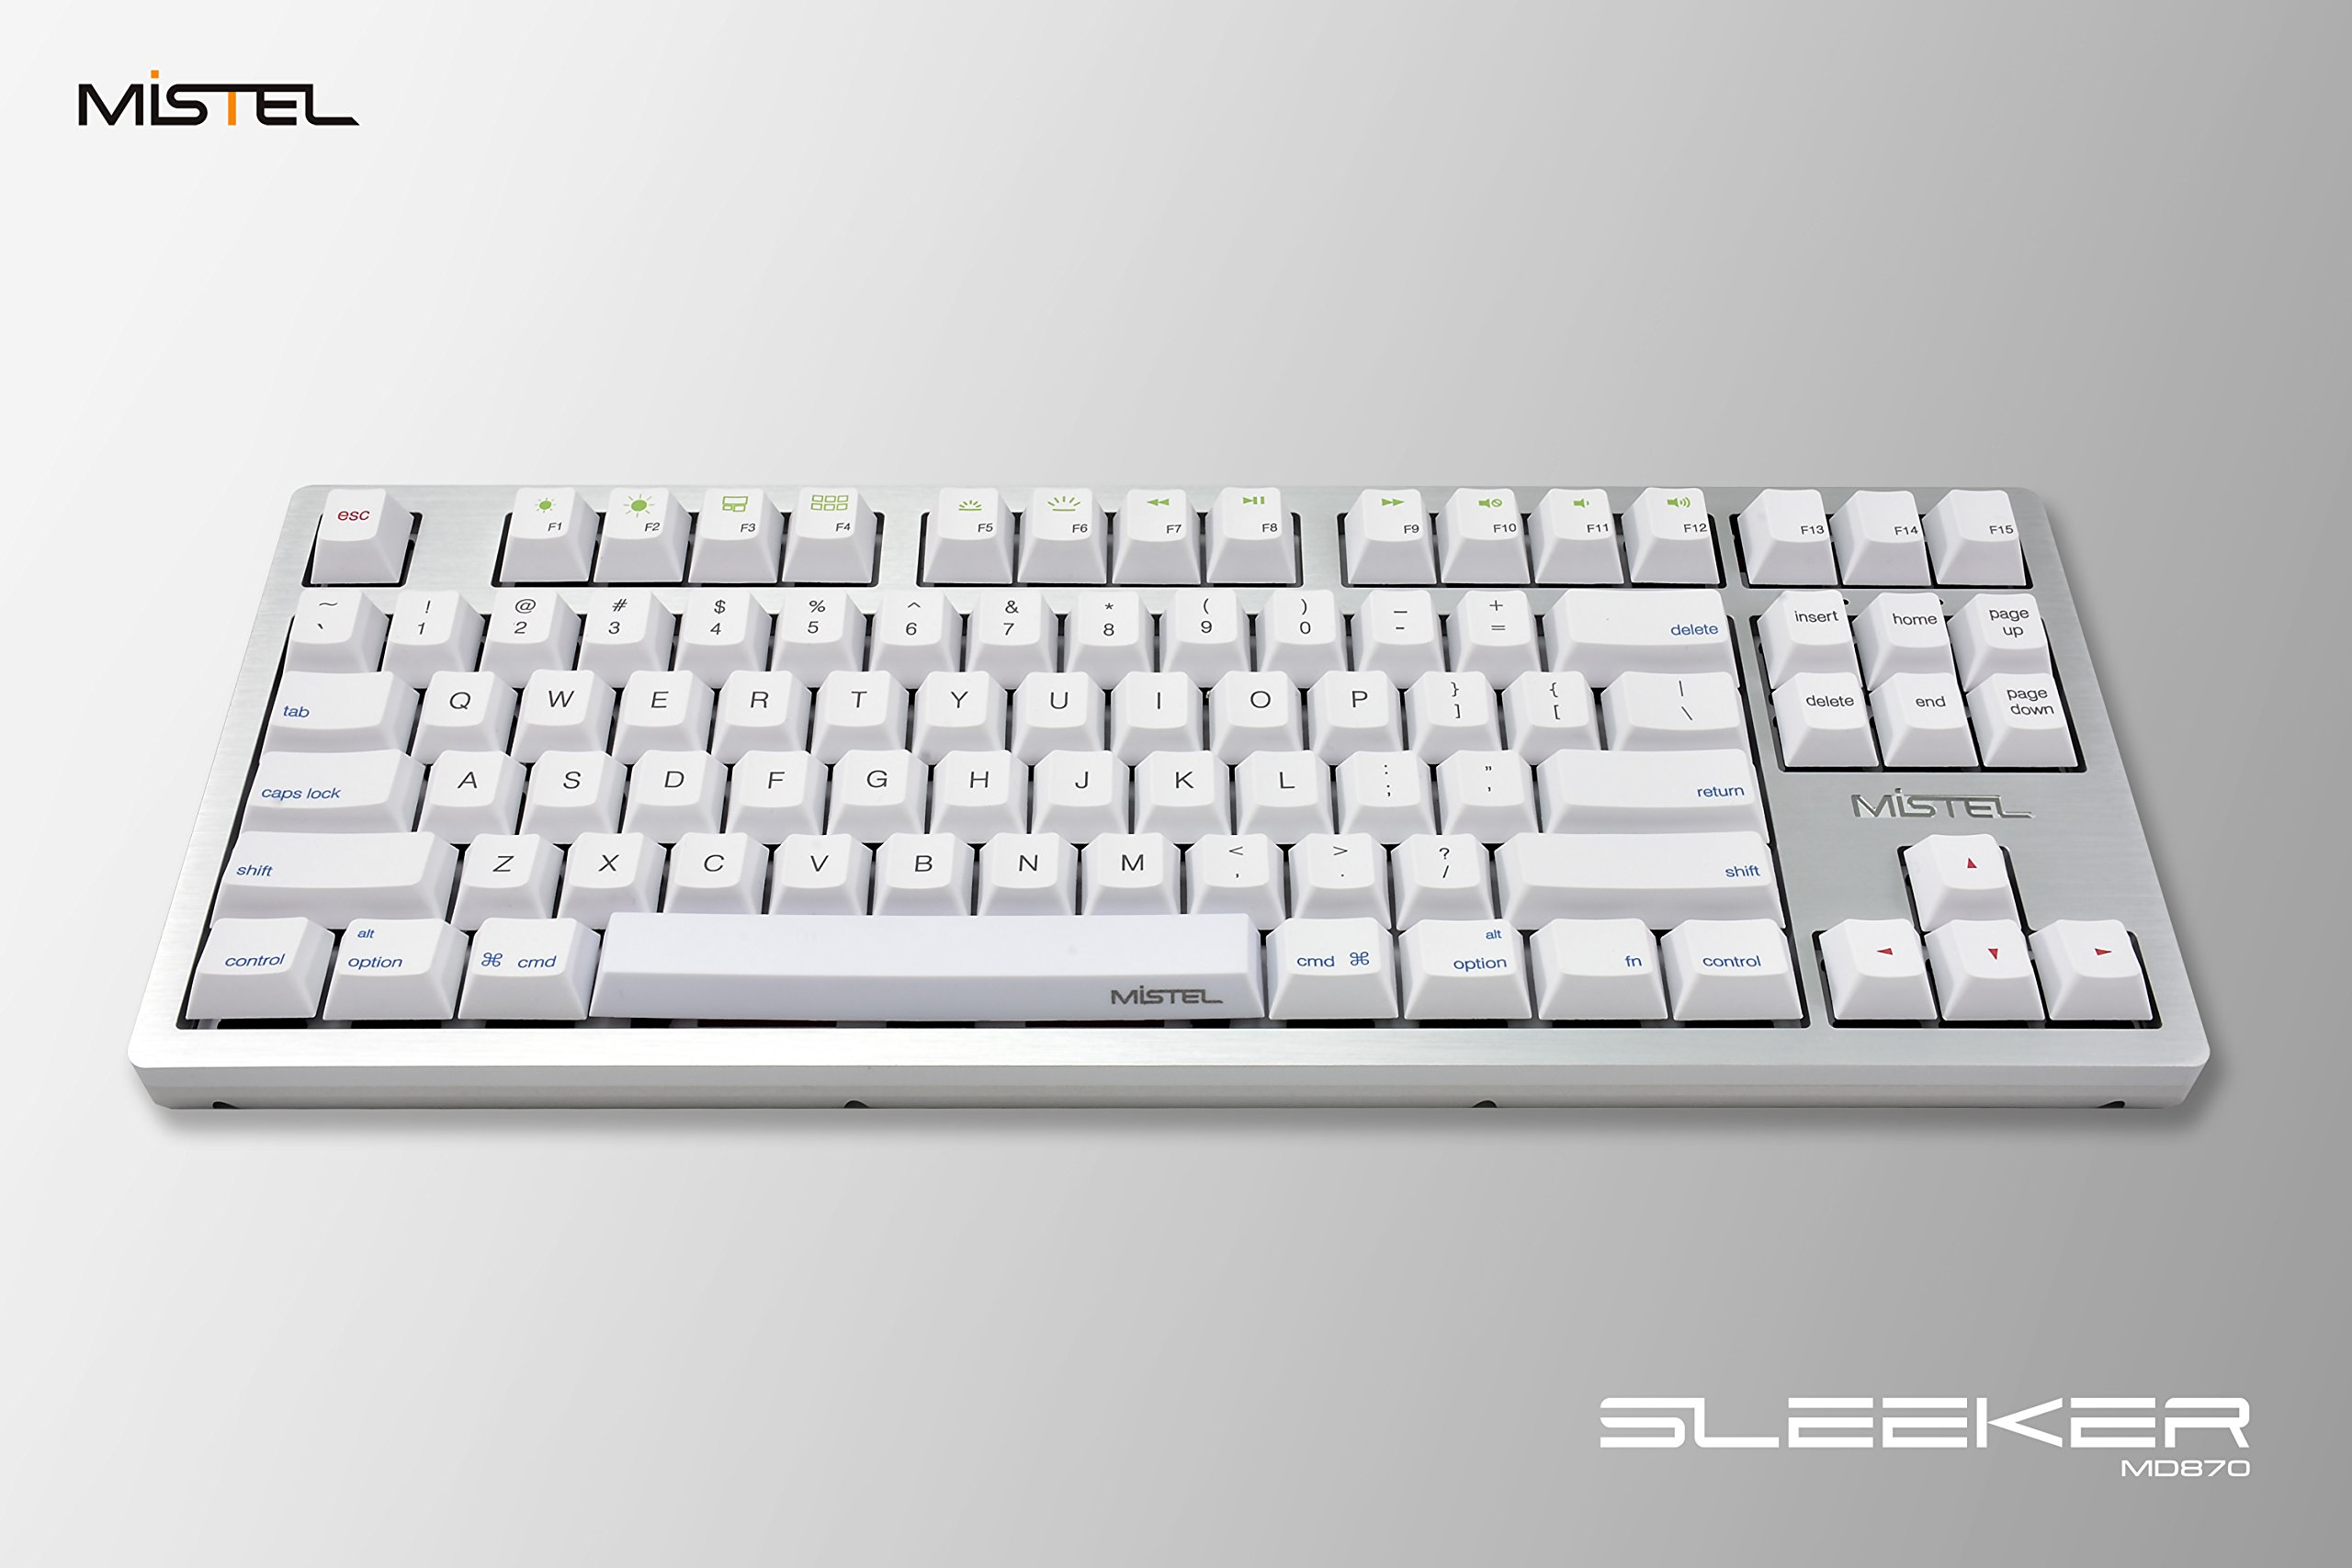 Mistel Sleeker MD870 Mechanical Keyboard Chrerry MX Black Switch